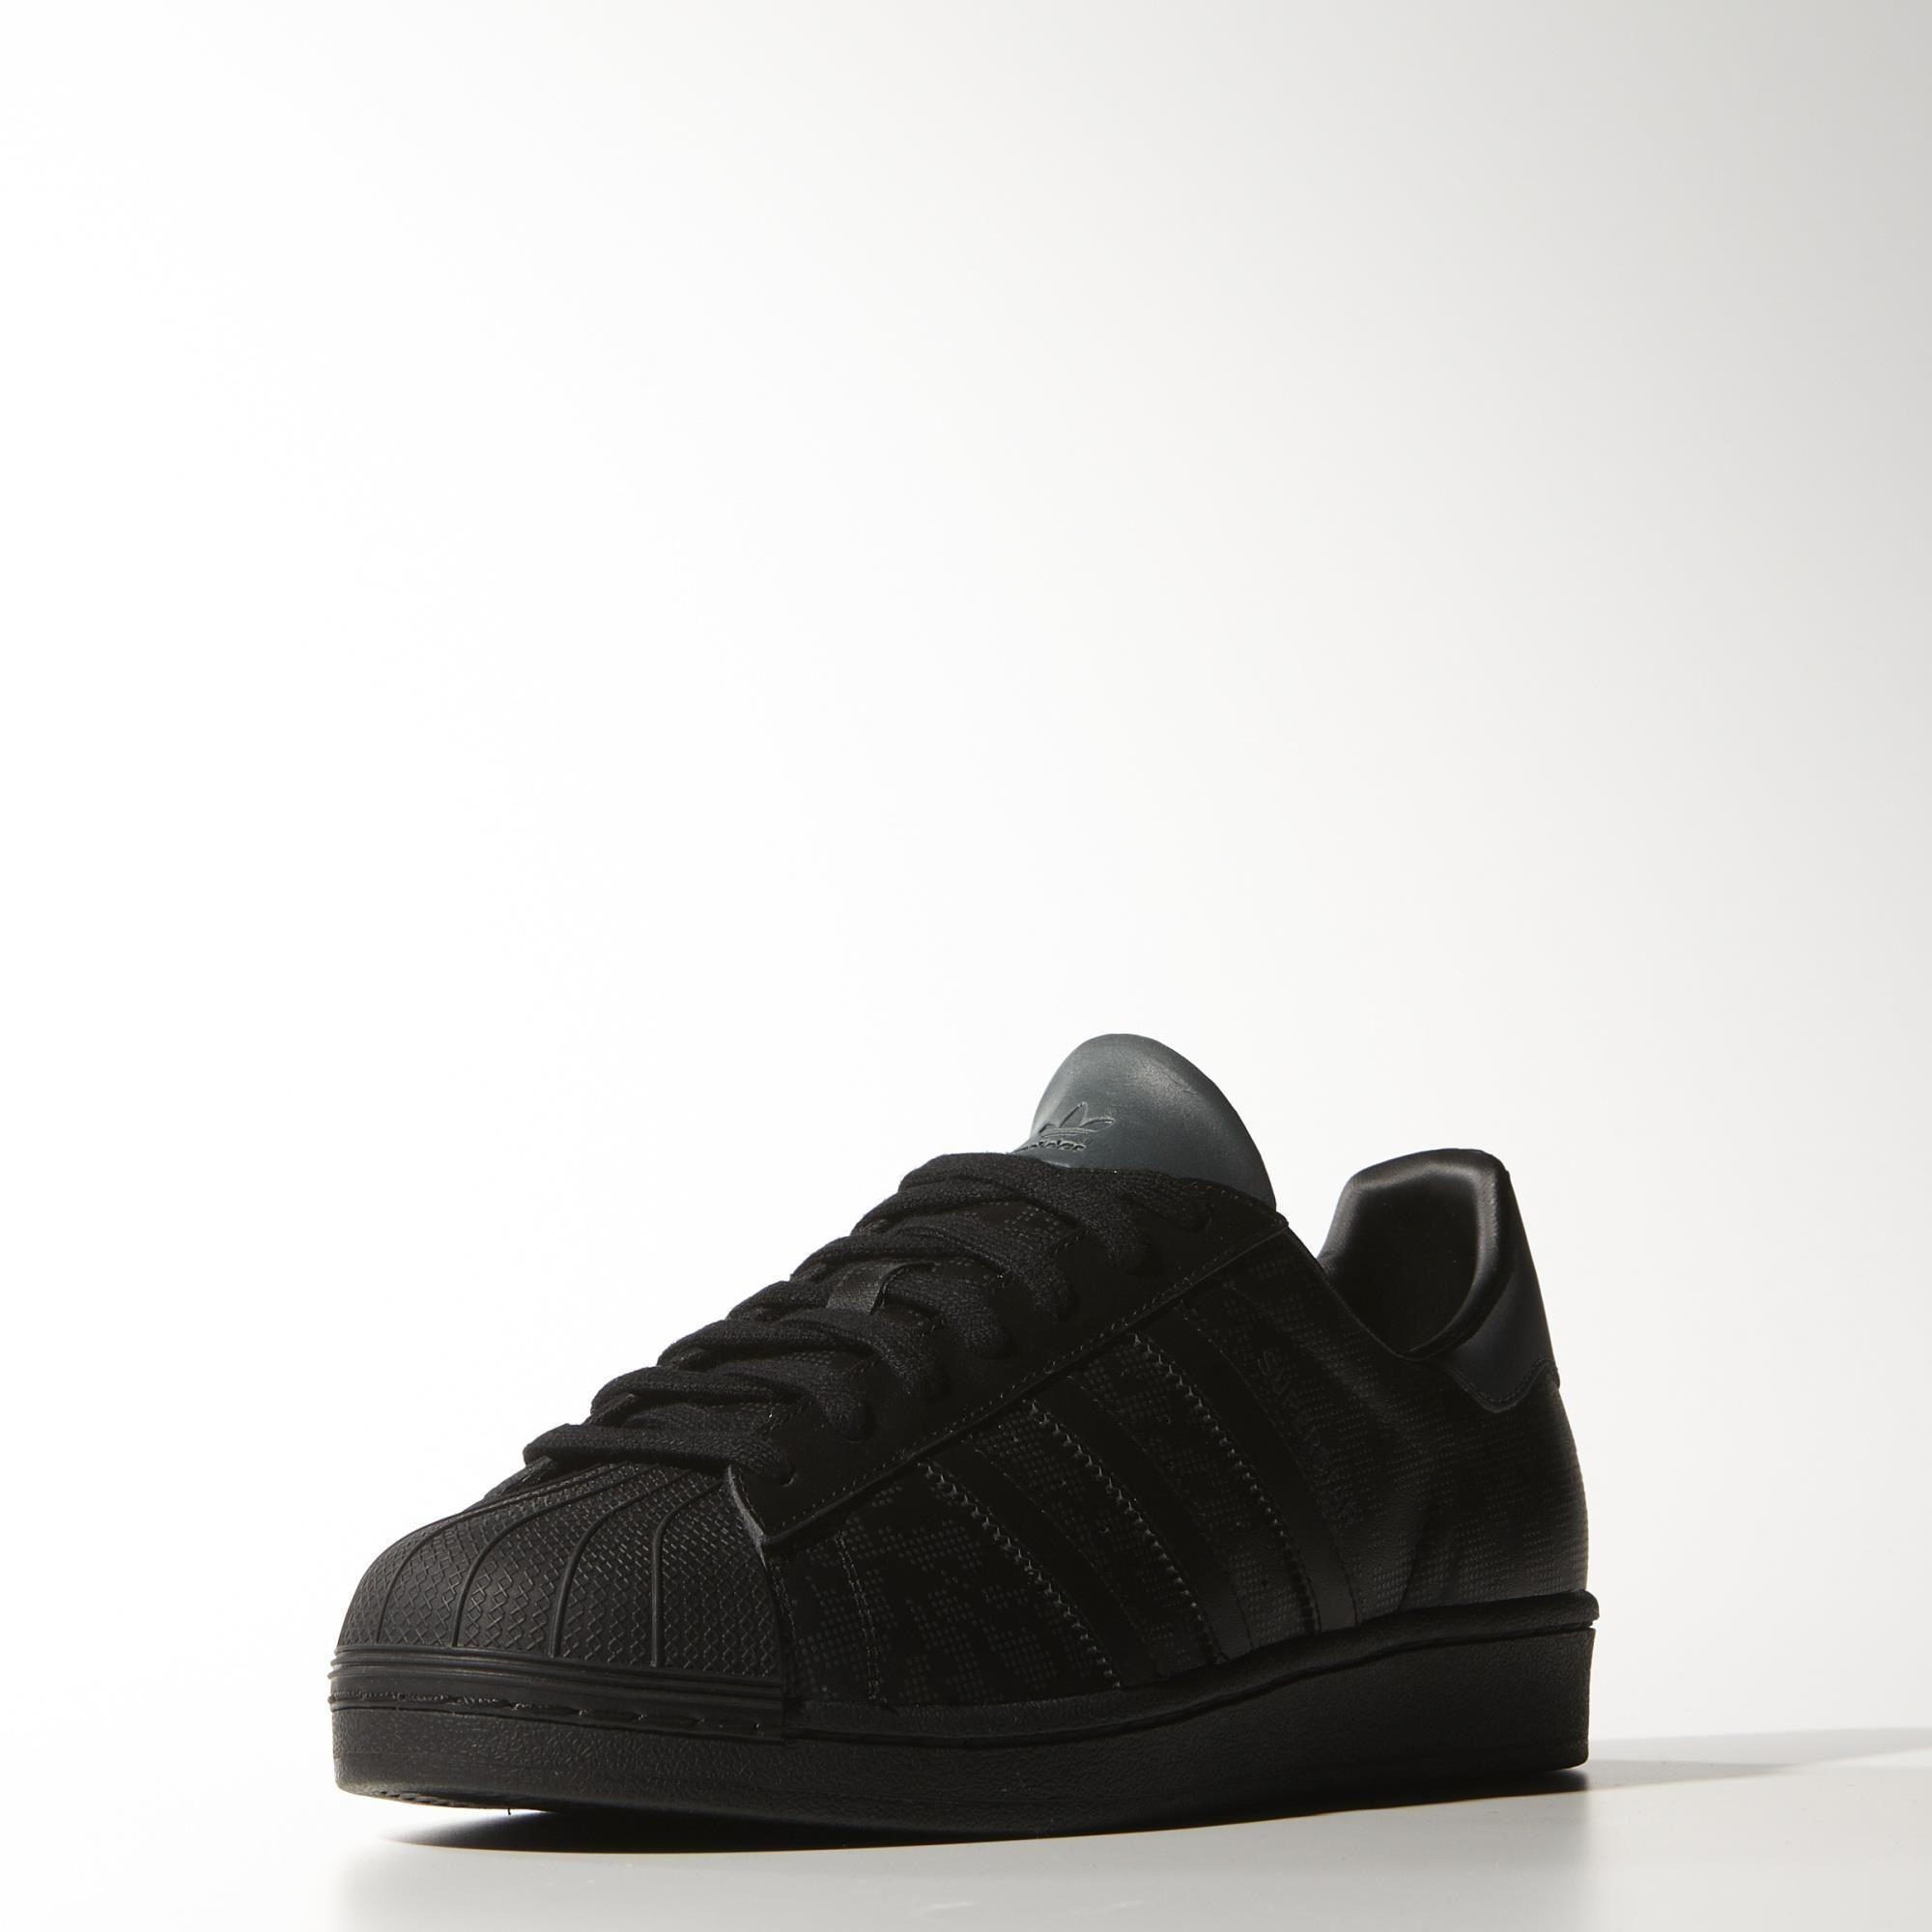 hot sales 3b7fa 07f52 Black adidas Superstar Shoes -